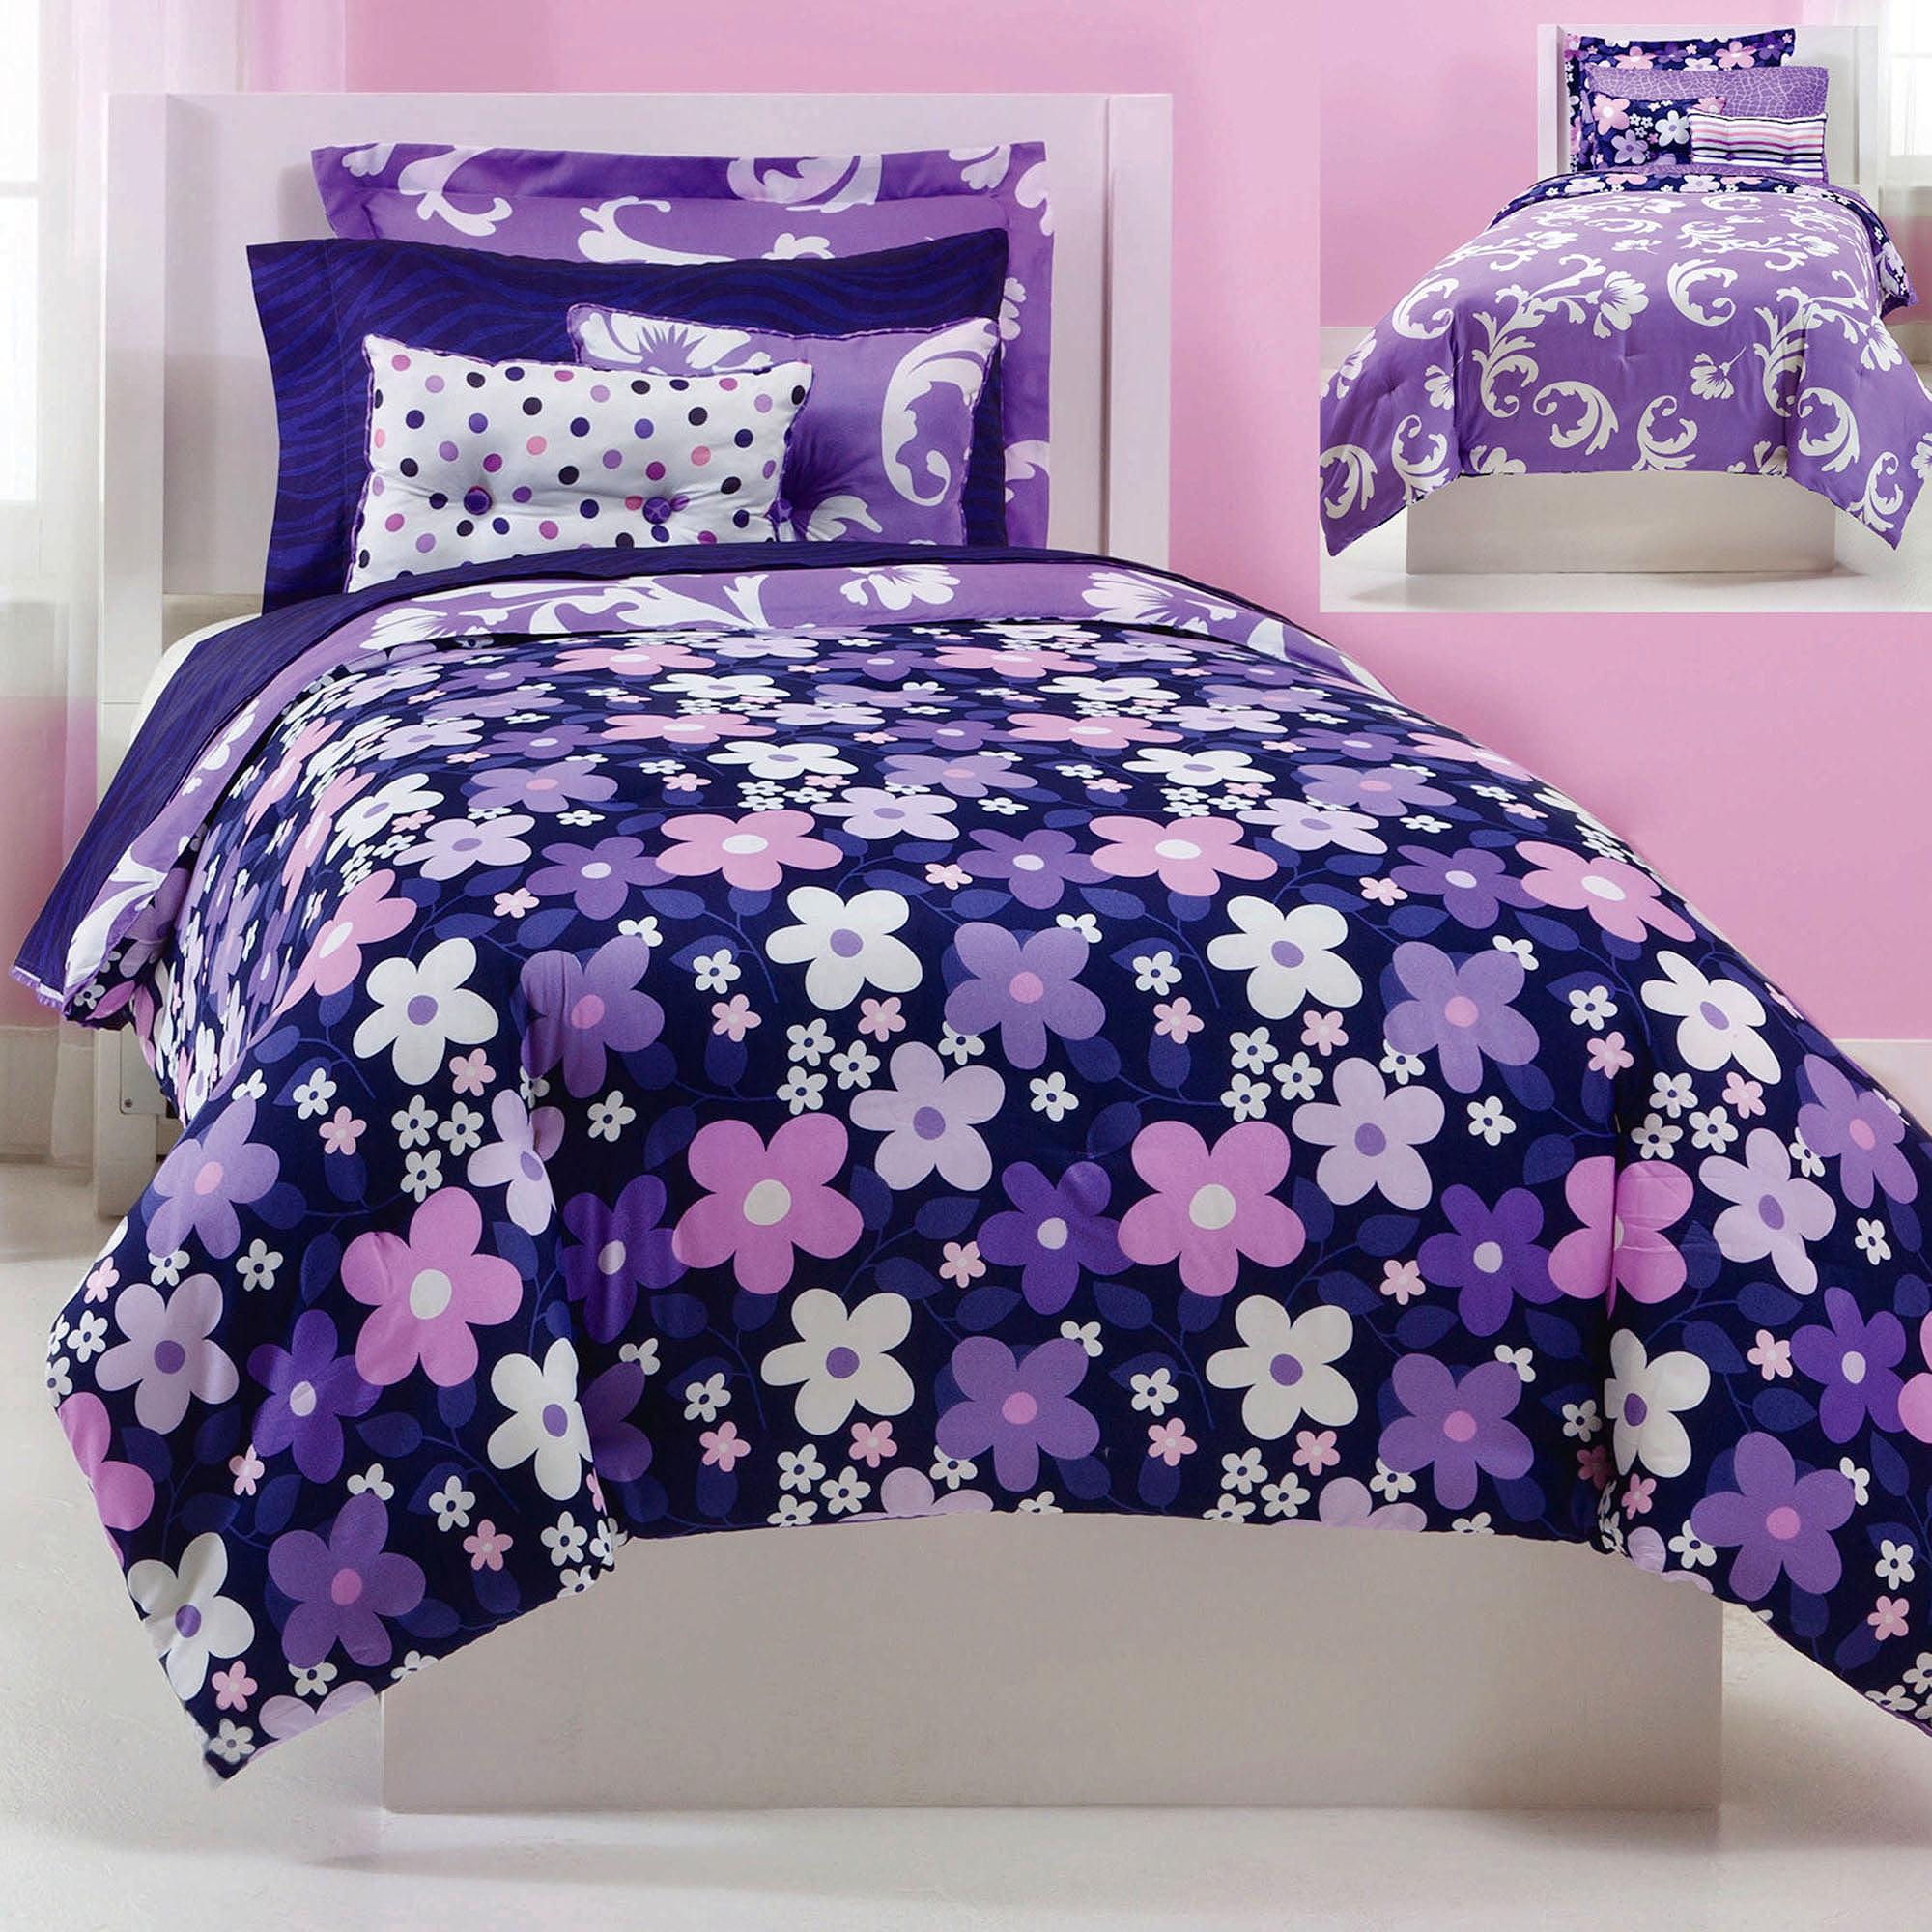 Exceptional Jackie Twist Grape Gatsby Bedding Comforter Set, Purple   Walmart.com